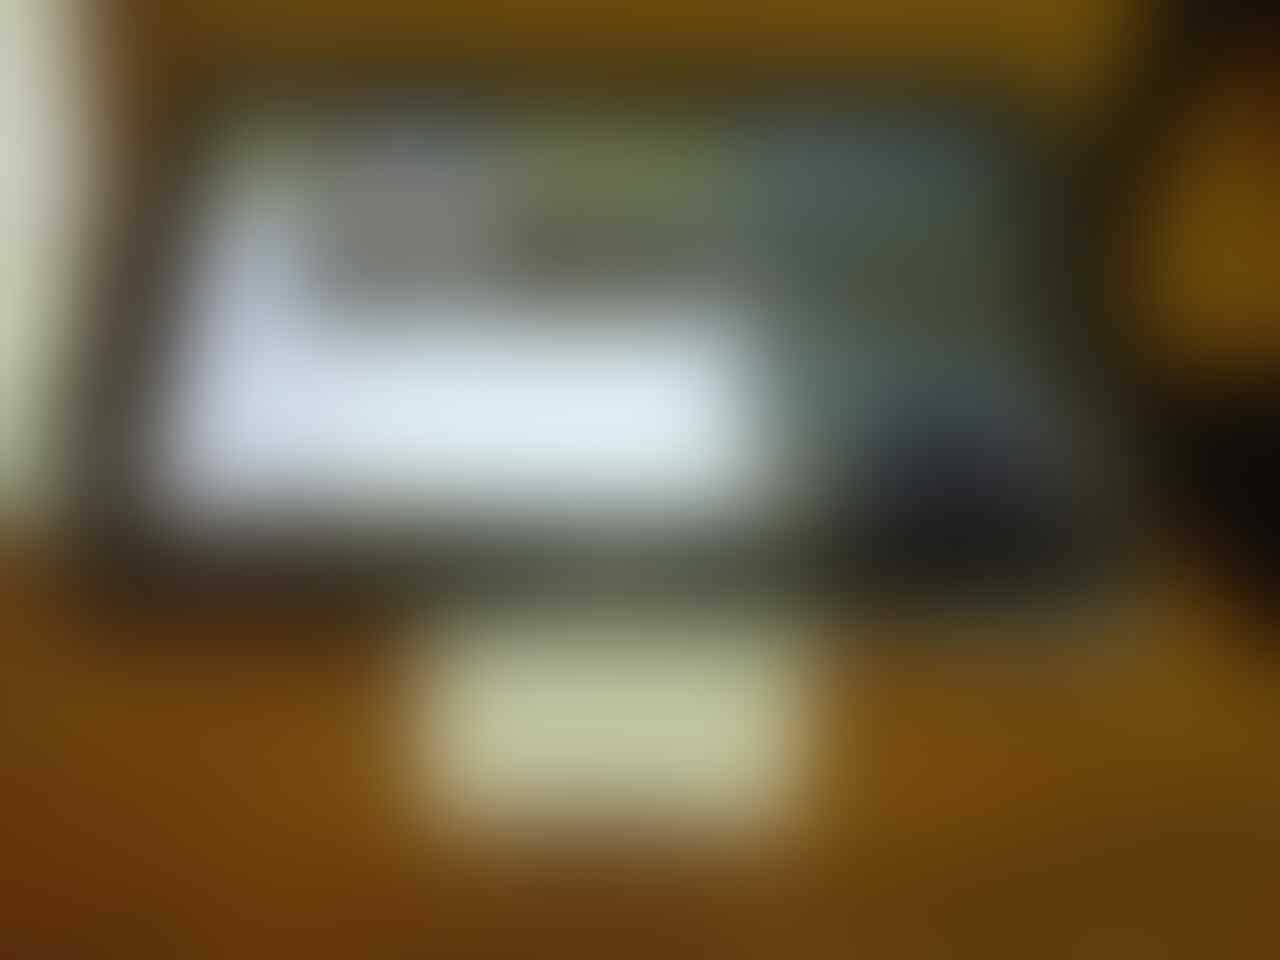 (REPOST) samsung galaxy tab 2 P5100 16GB MULUS jakarta pusat (KHUSUS HARI INI SAJA)